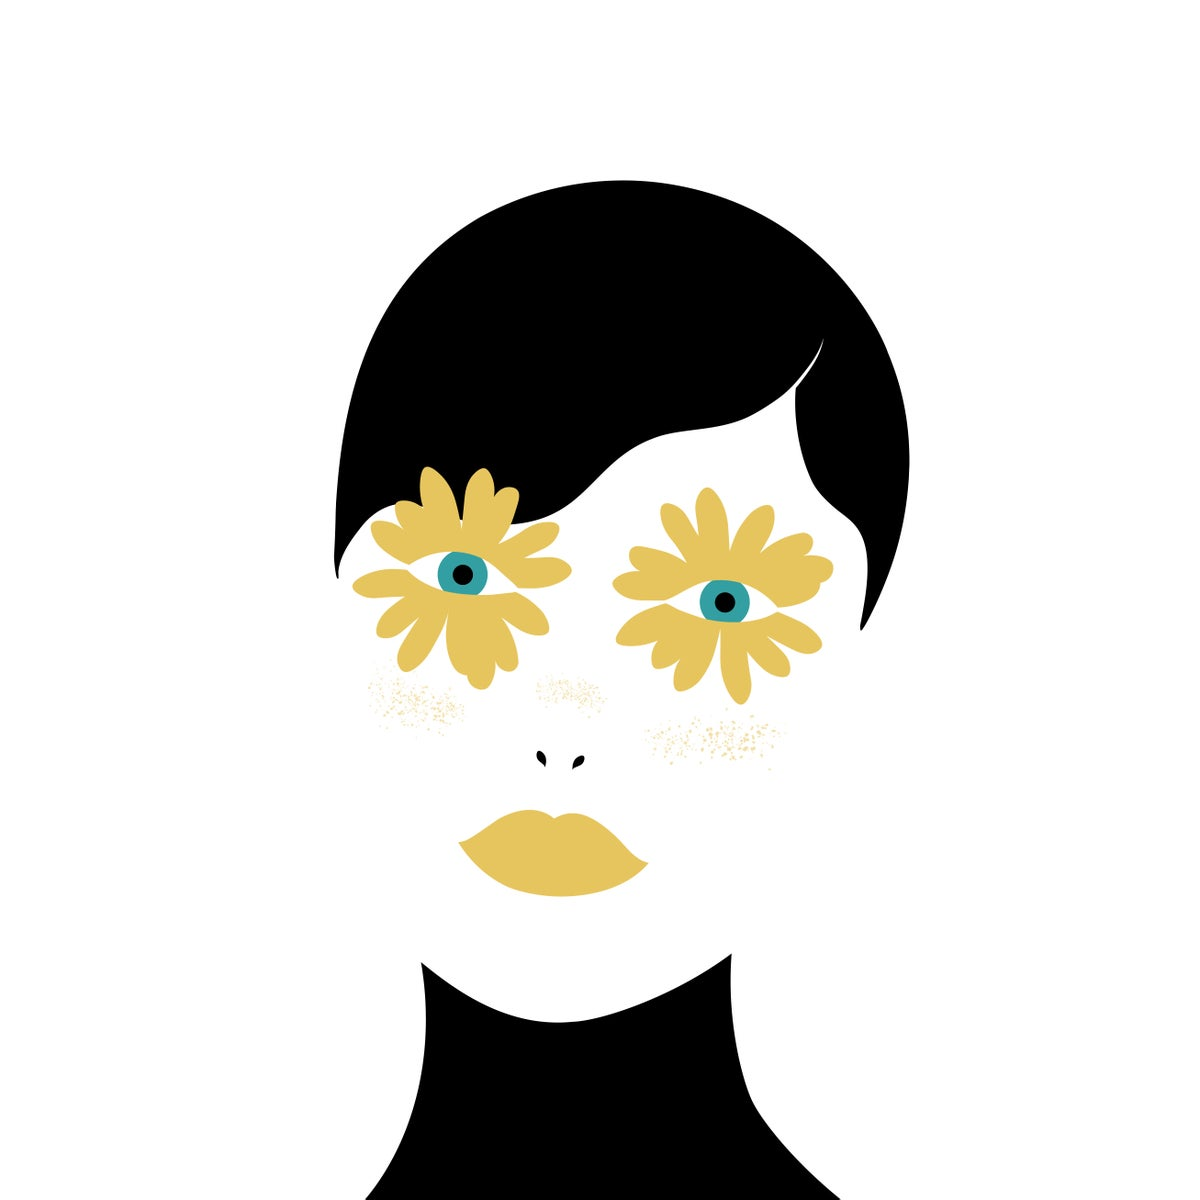 Image of Eyes of daisies